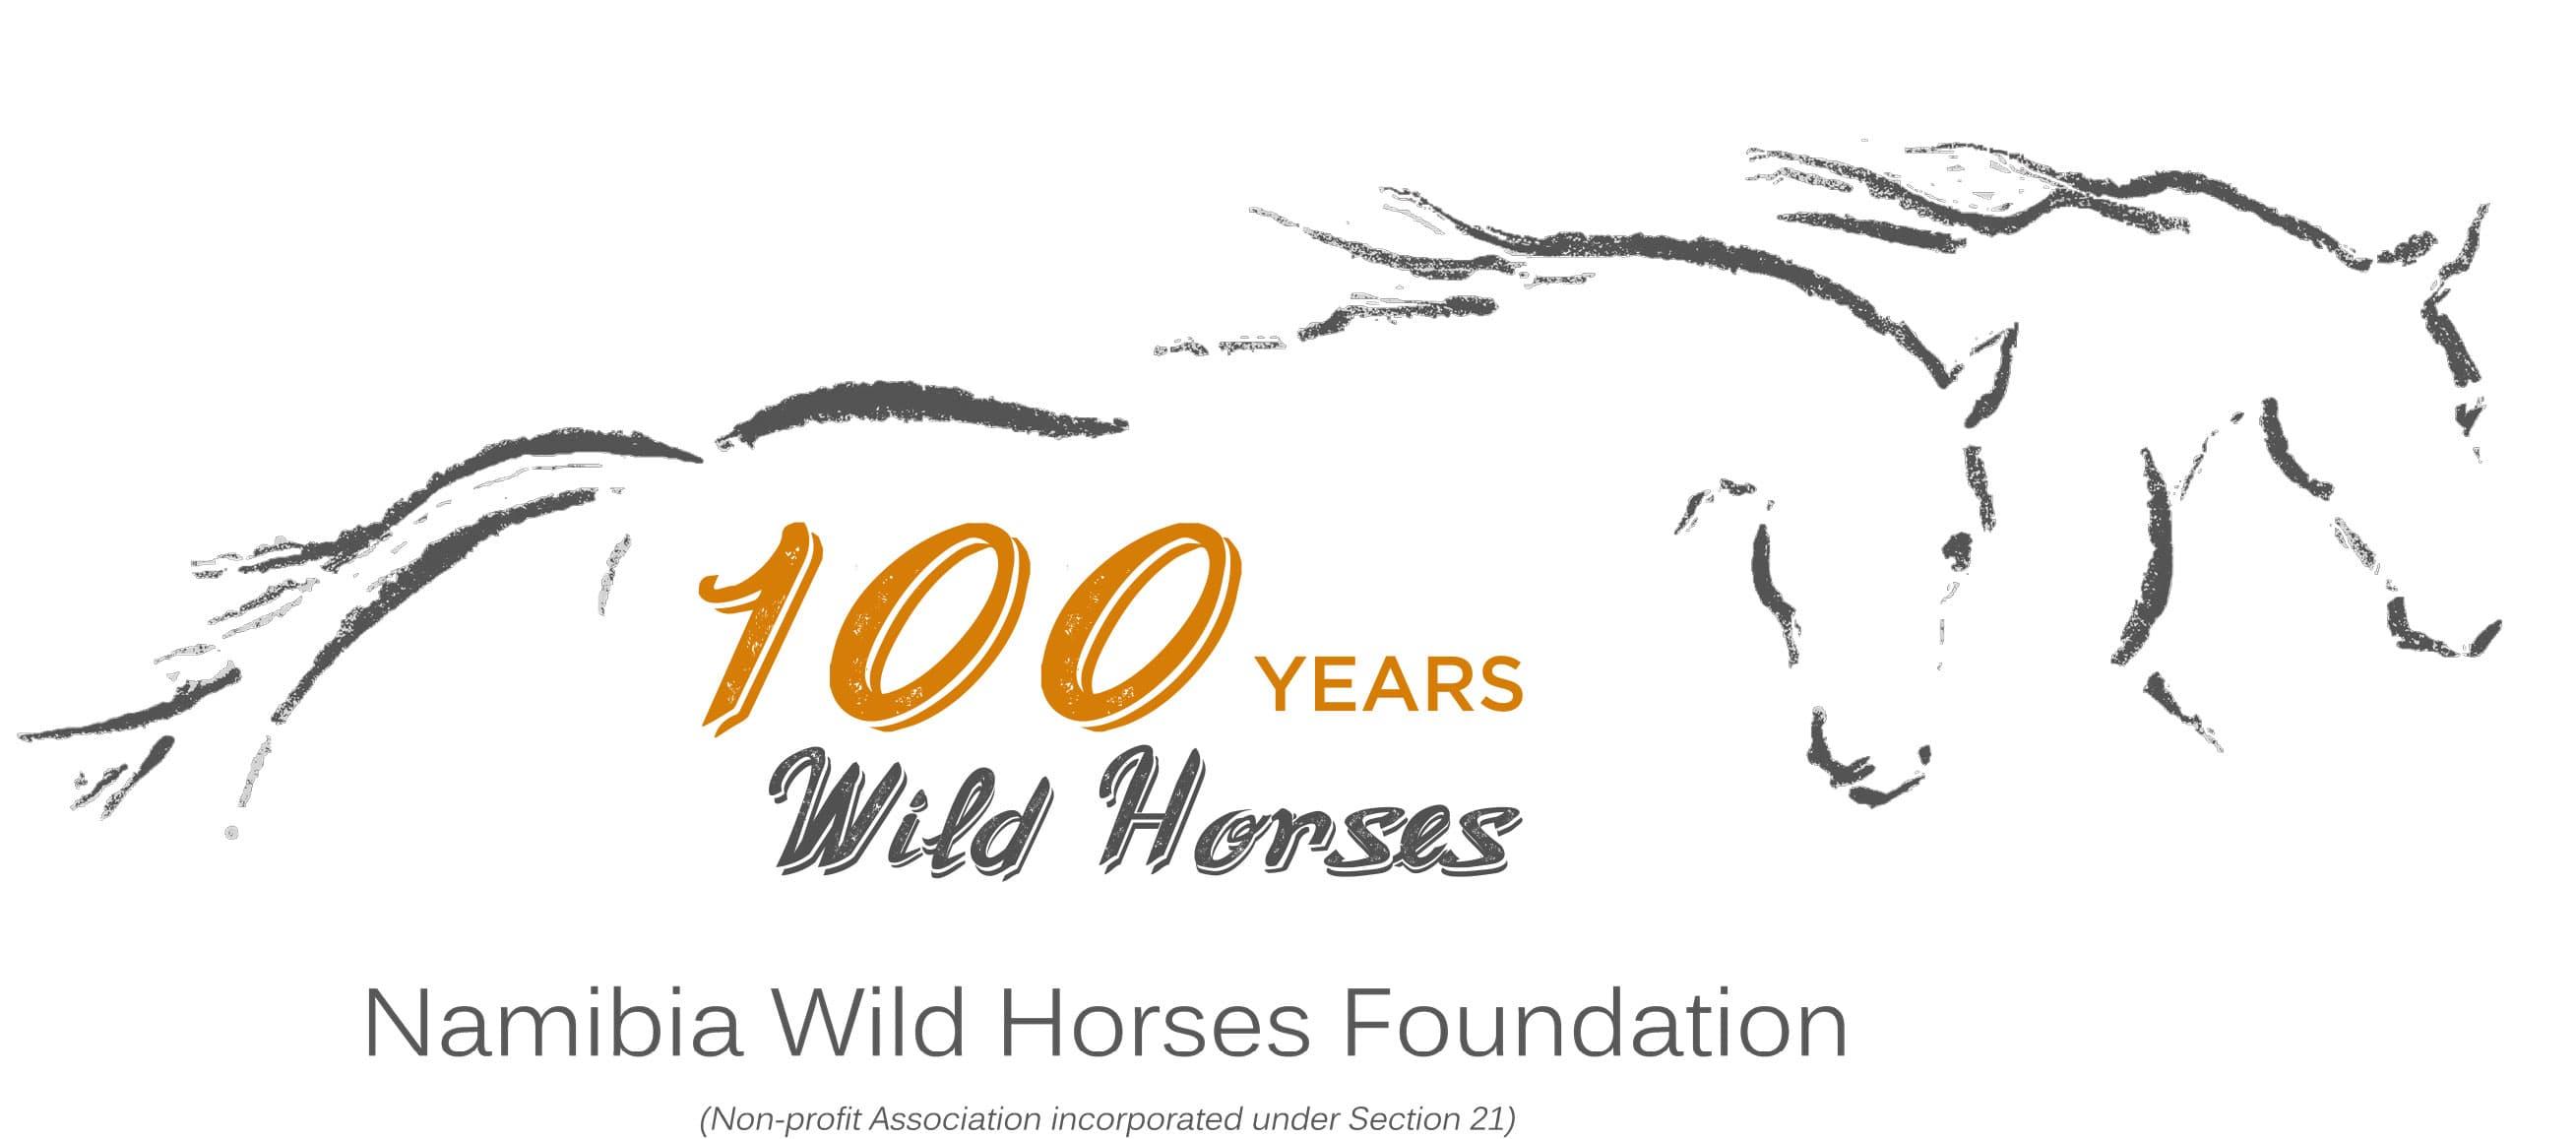 Celebrating a century of wild horses